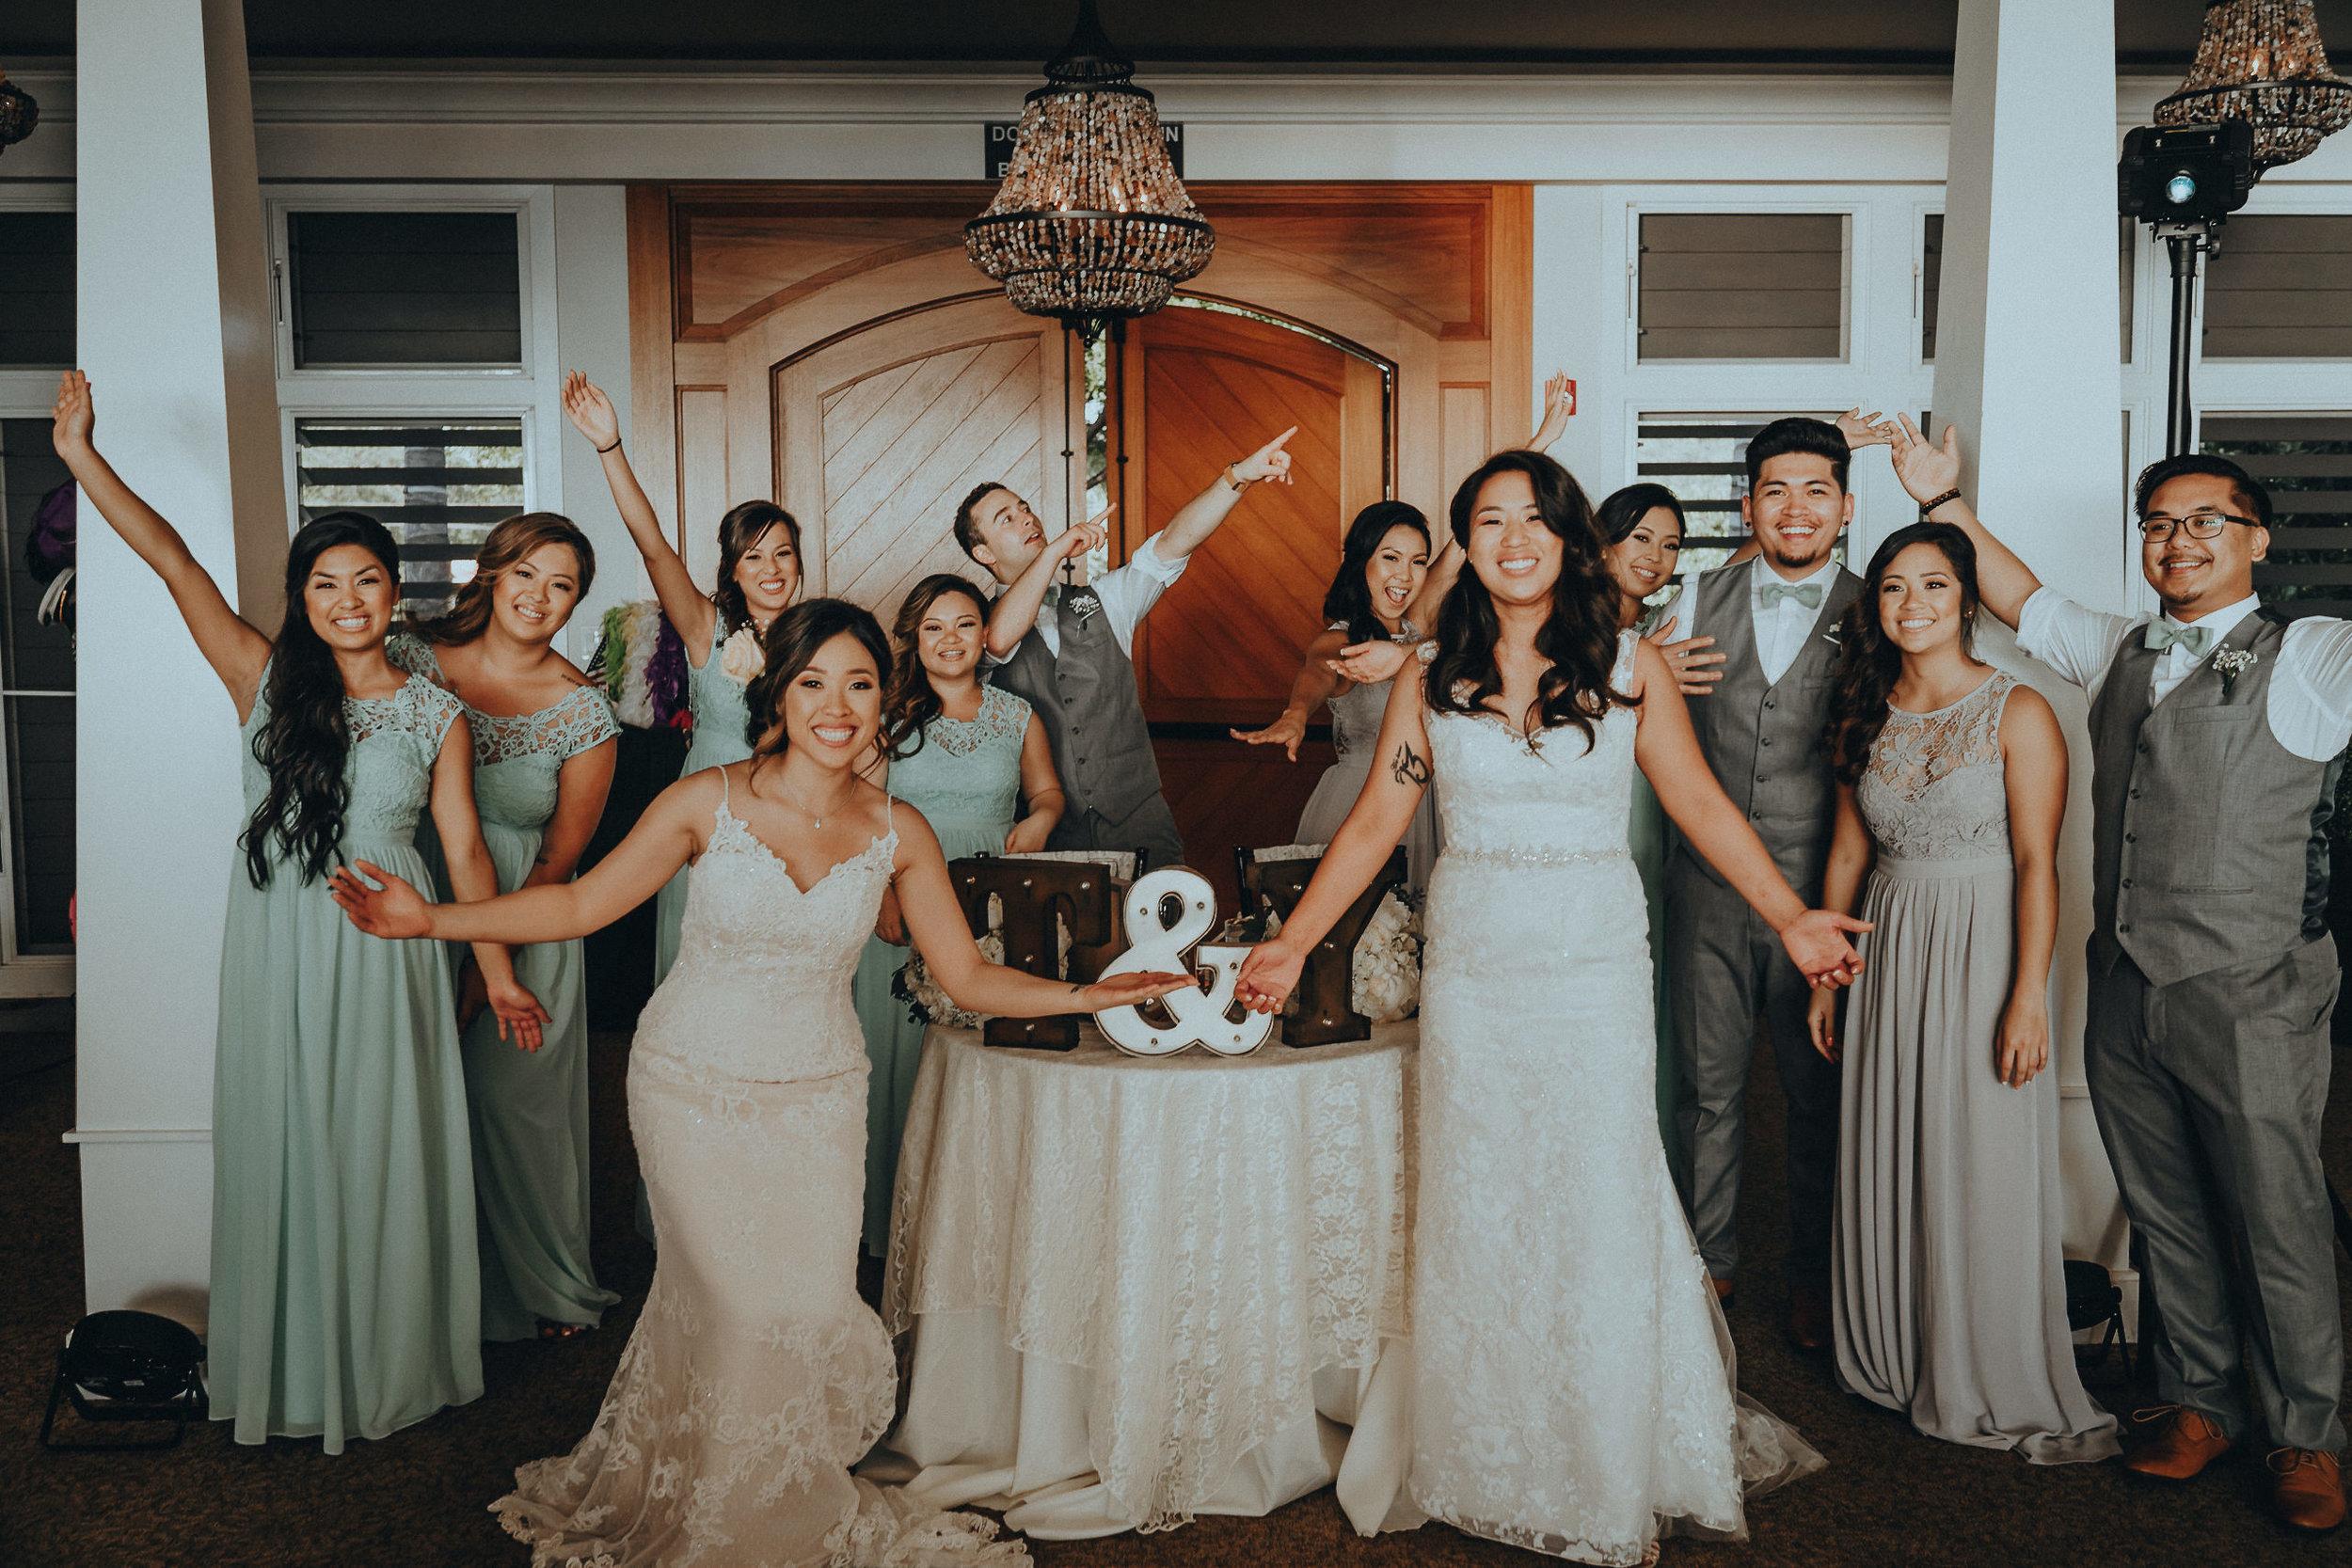 Maui_Destination_wedding_Alfred_Tang-37.jpg